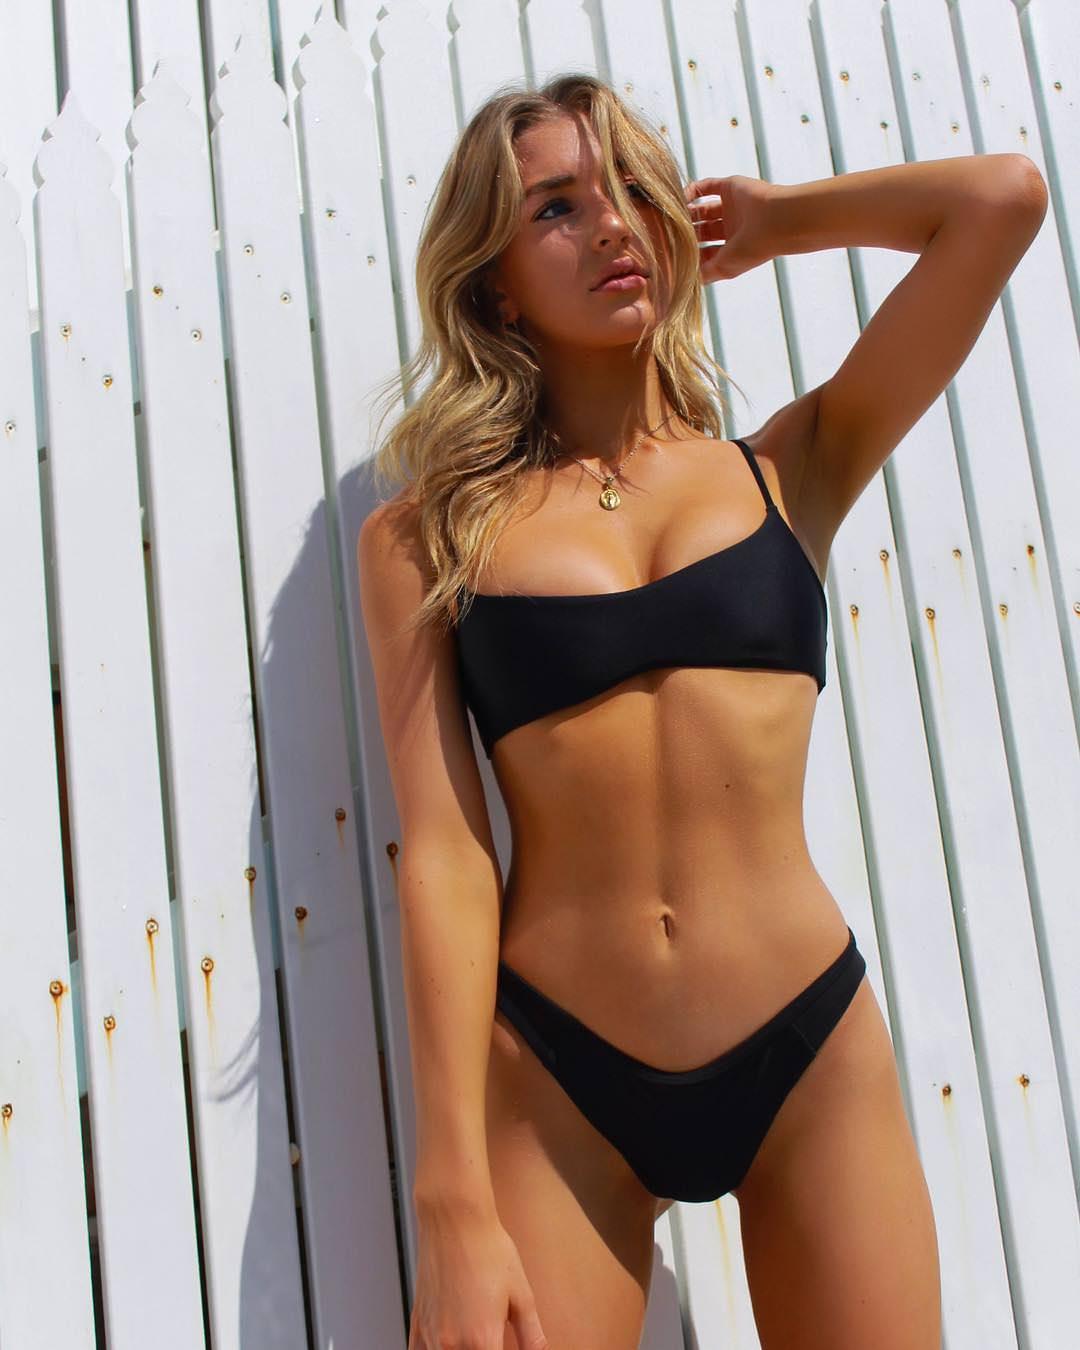 hot curvy girl